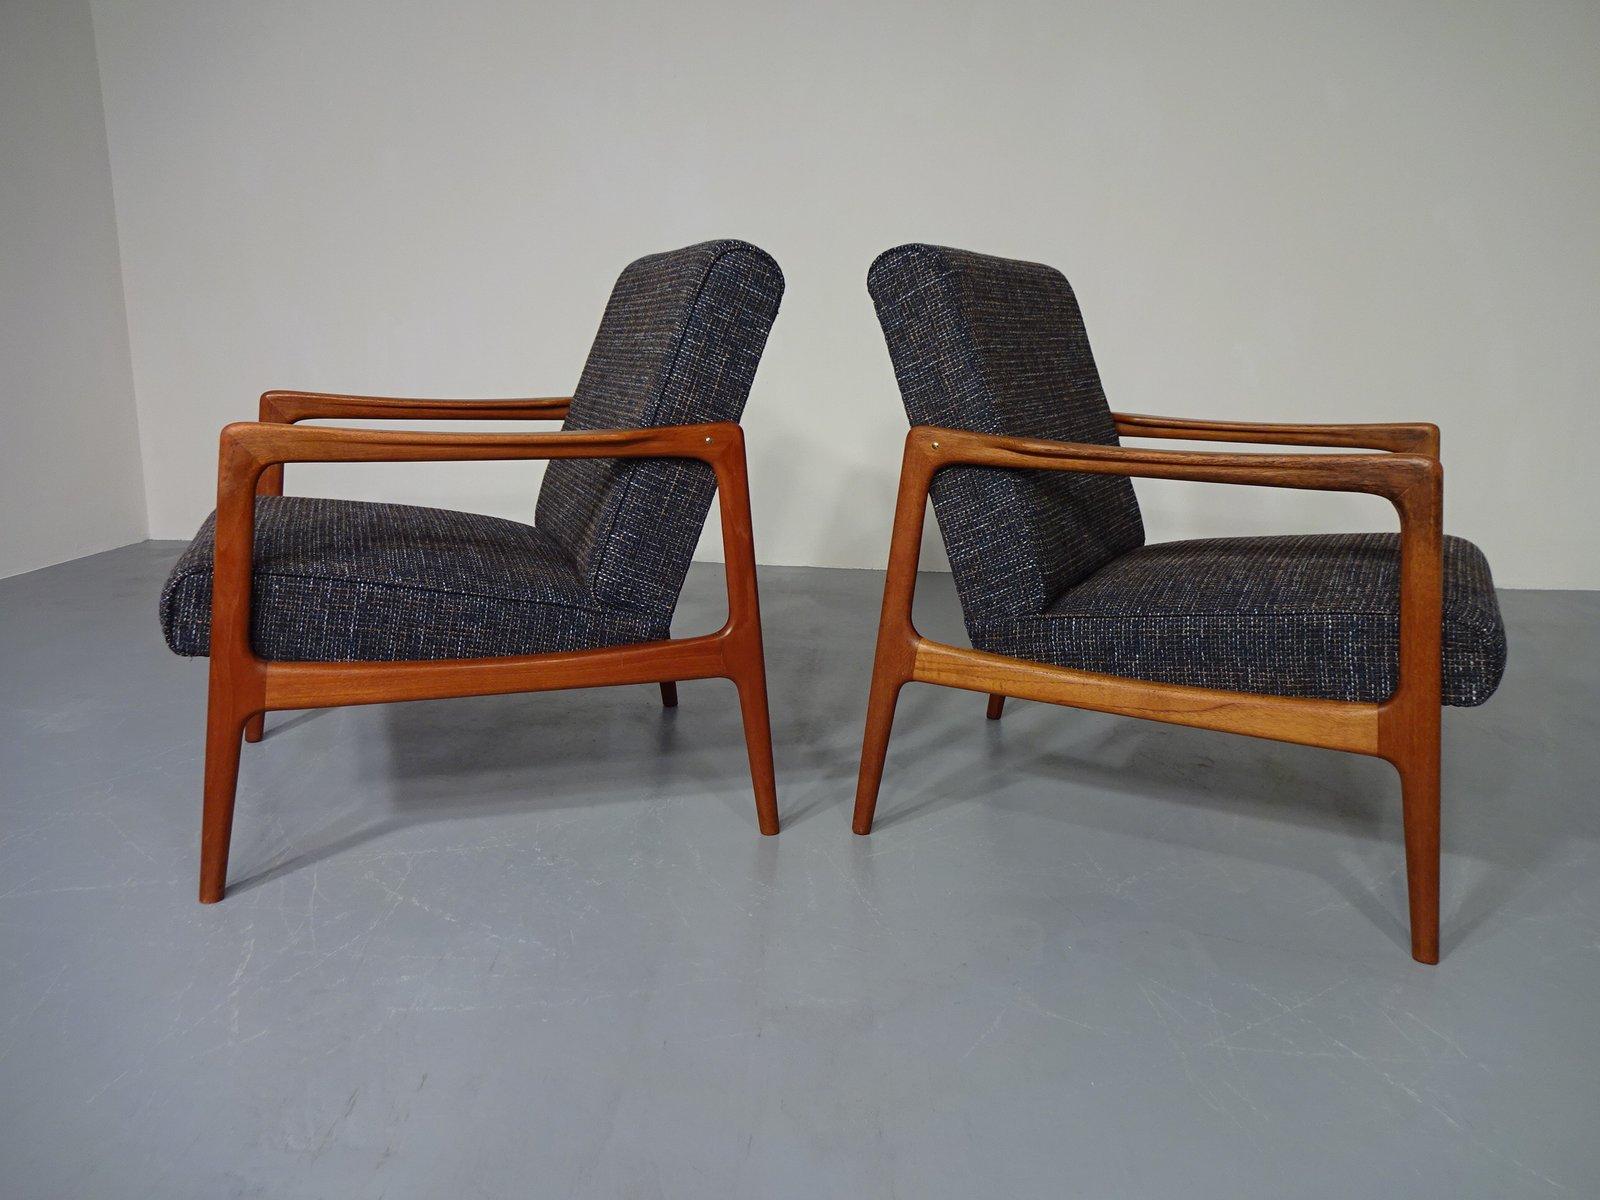 Dänischer Sessel aus Teakholz, 1960er, 2er Set